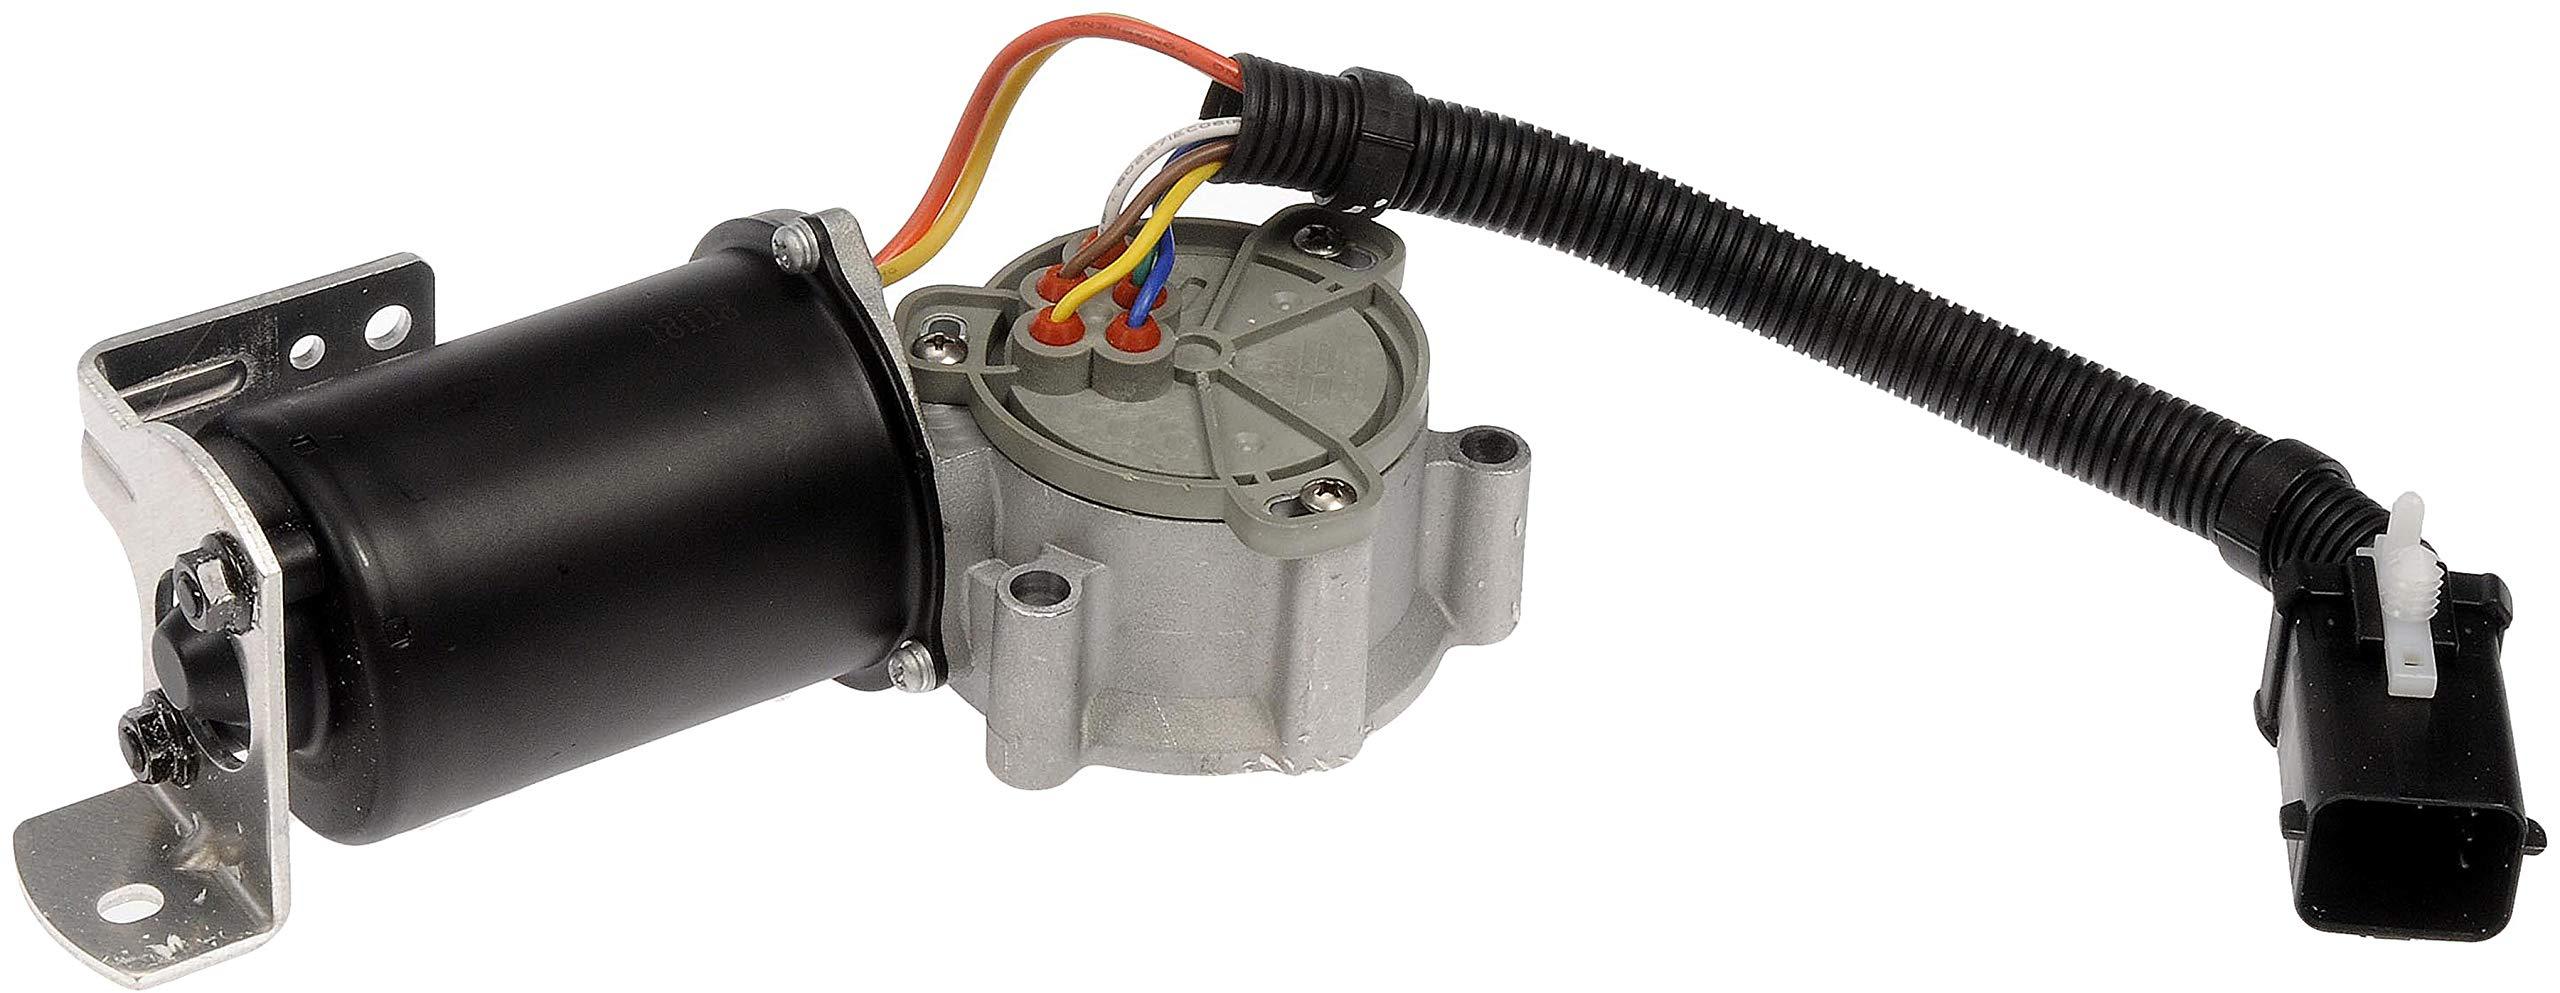 Dorman 600-571 Transfer Case Motor